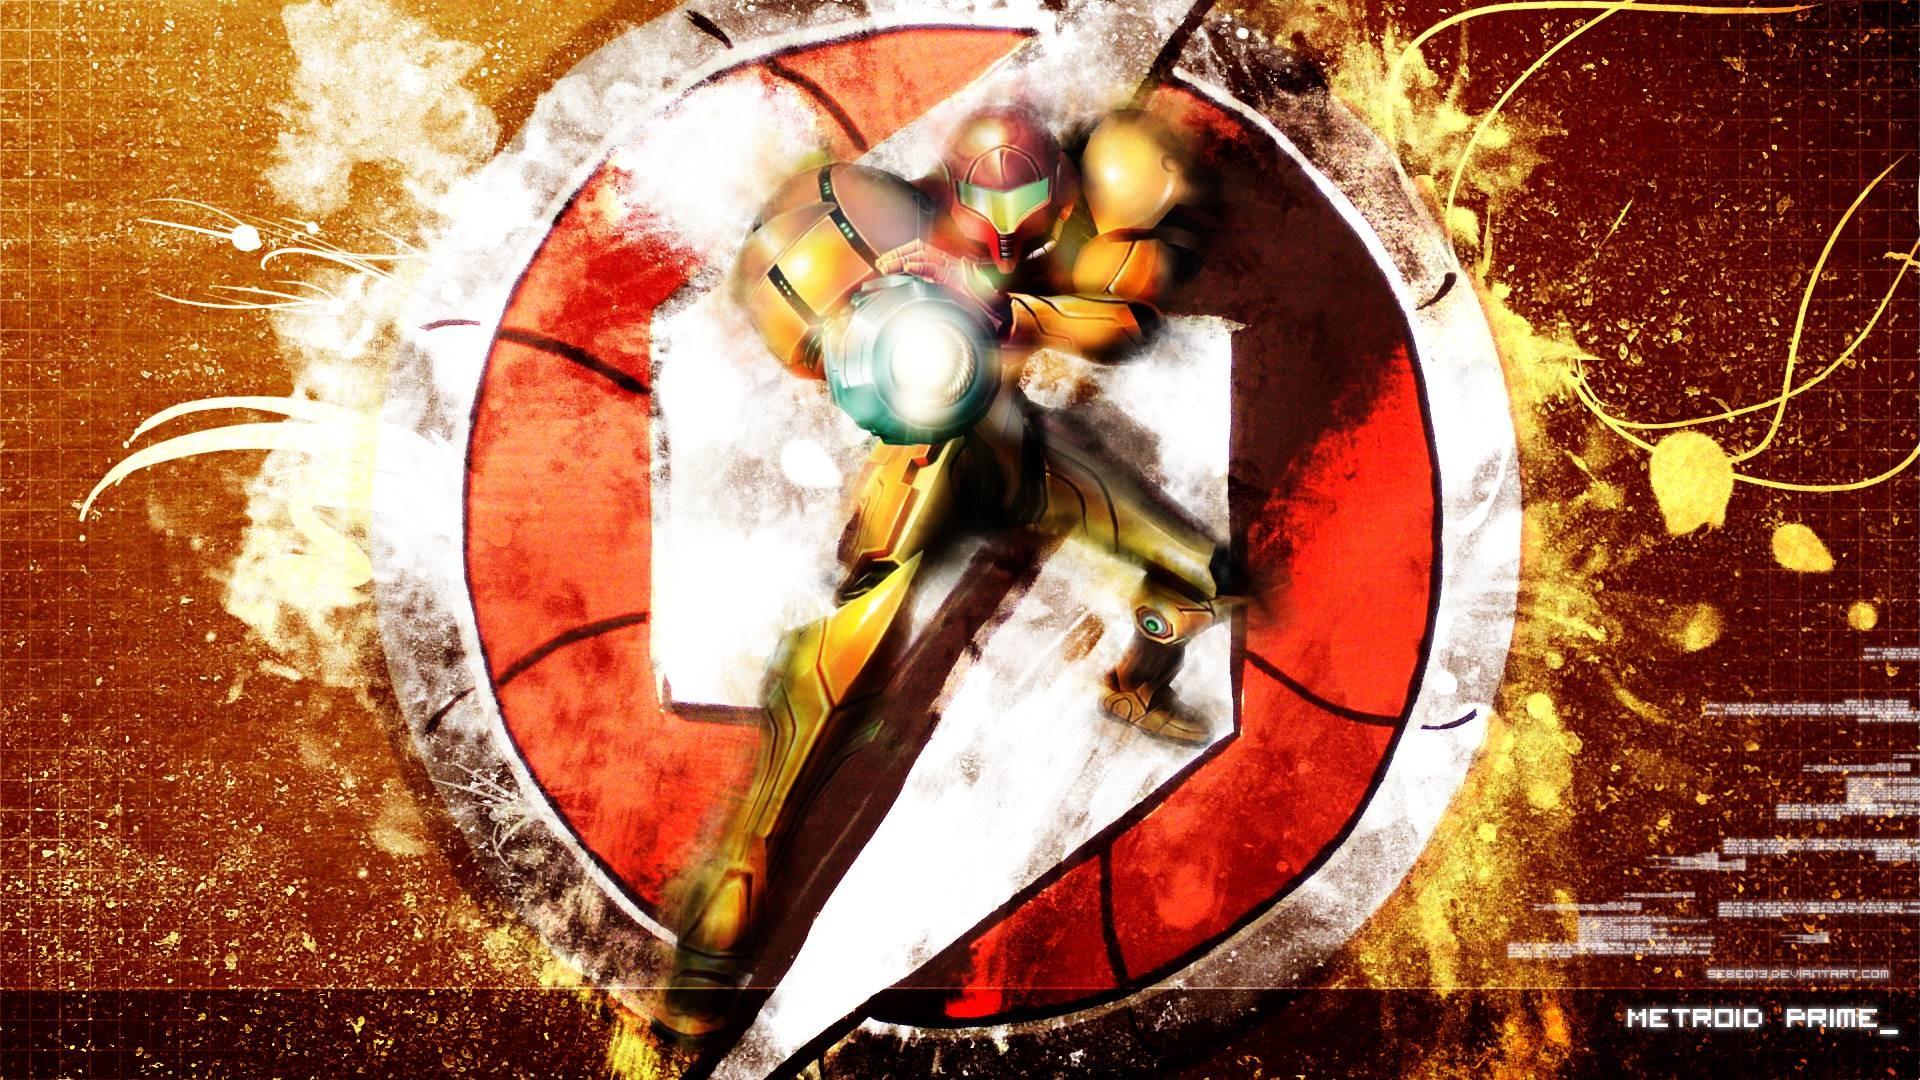 Metroid Prime wallpaper by sEbeQ13 on DeviantArt